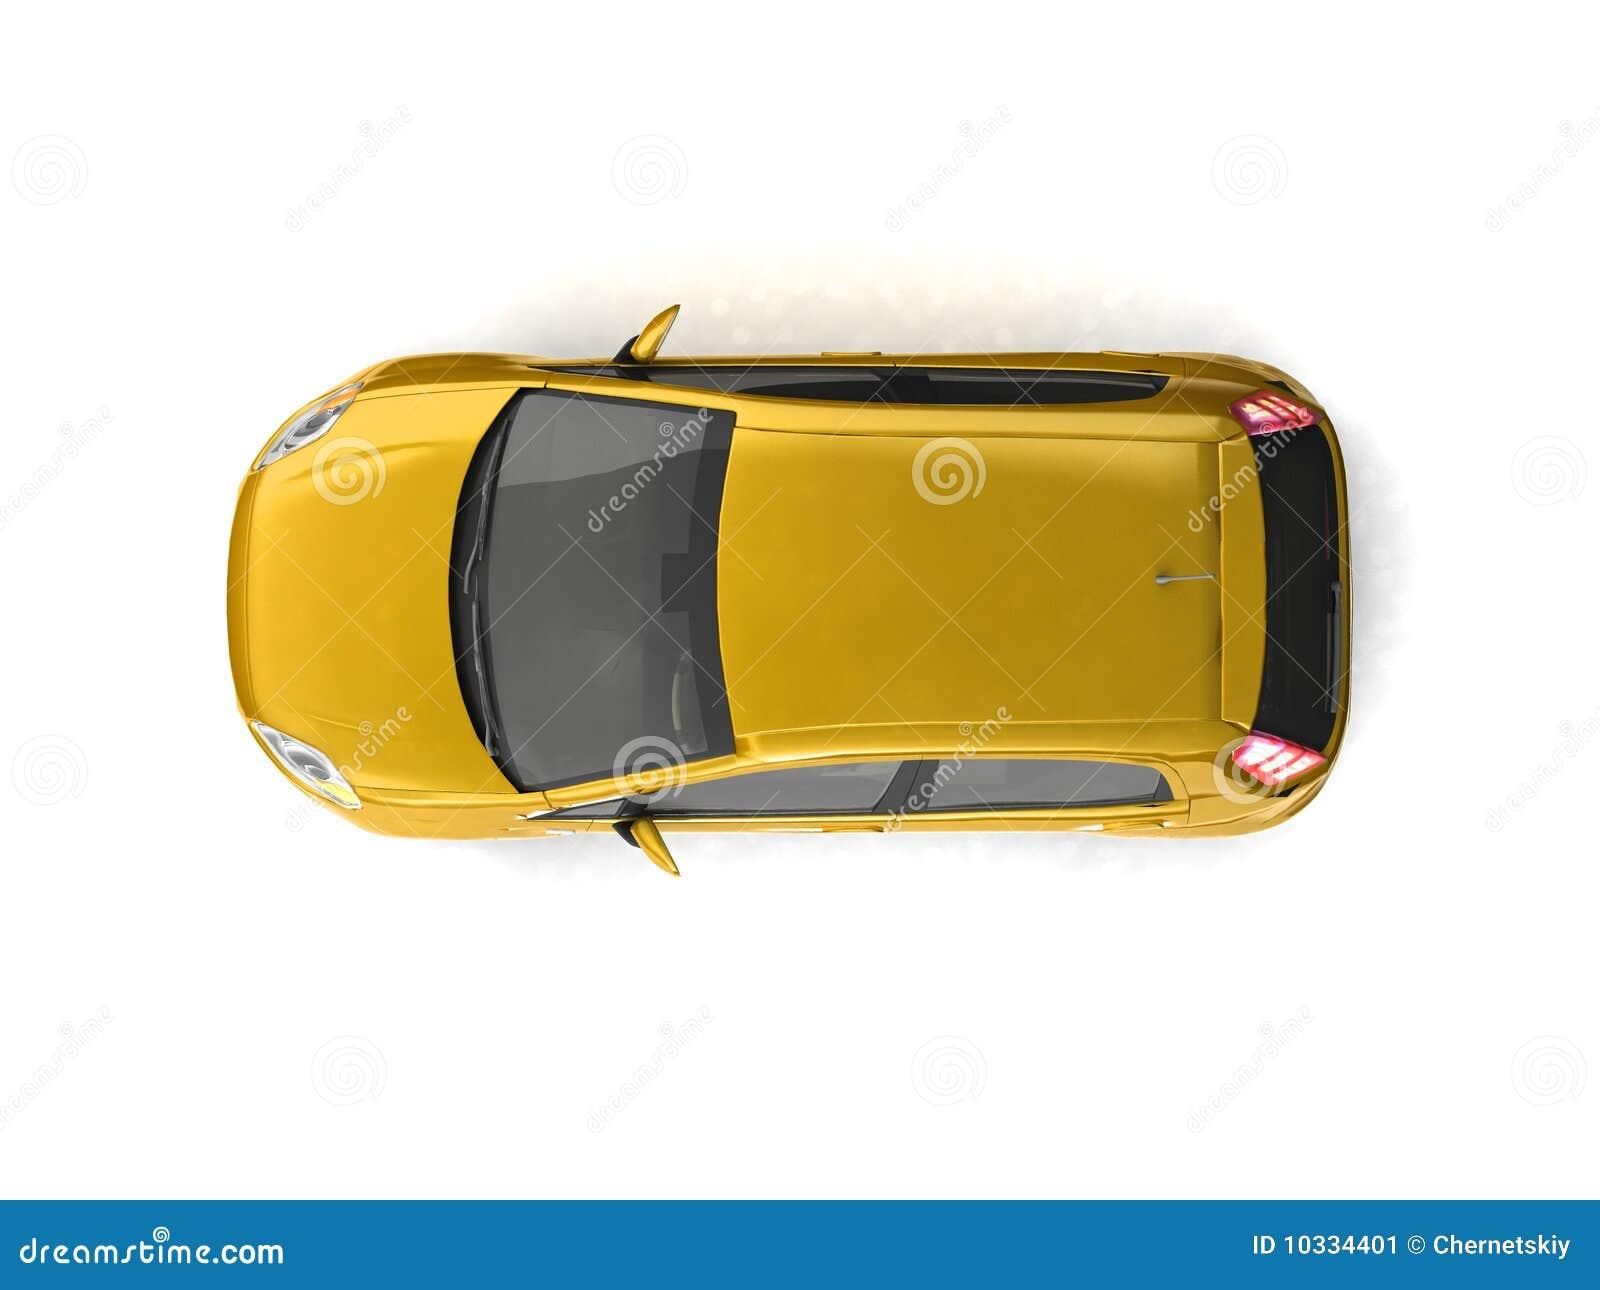 Car data check free uk dating 6